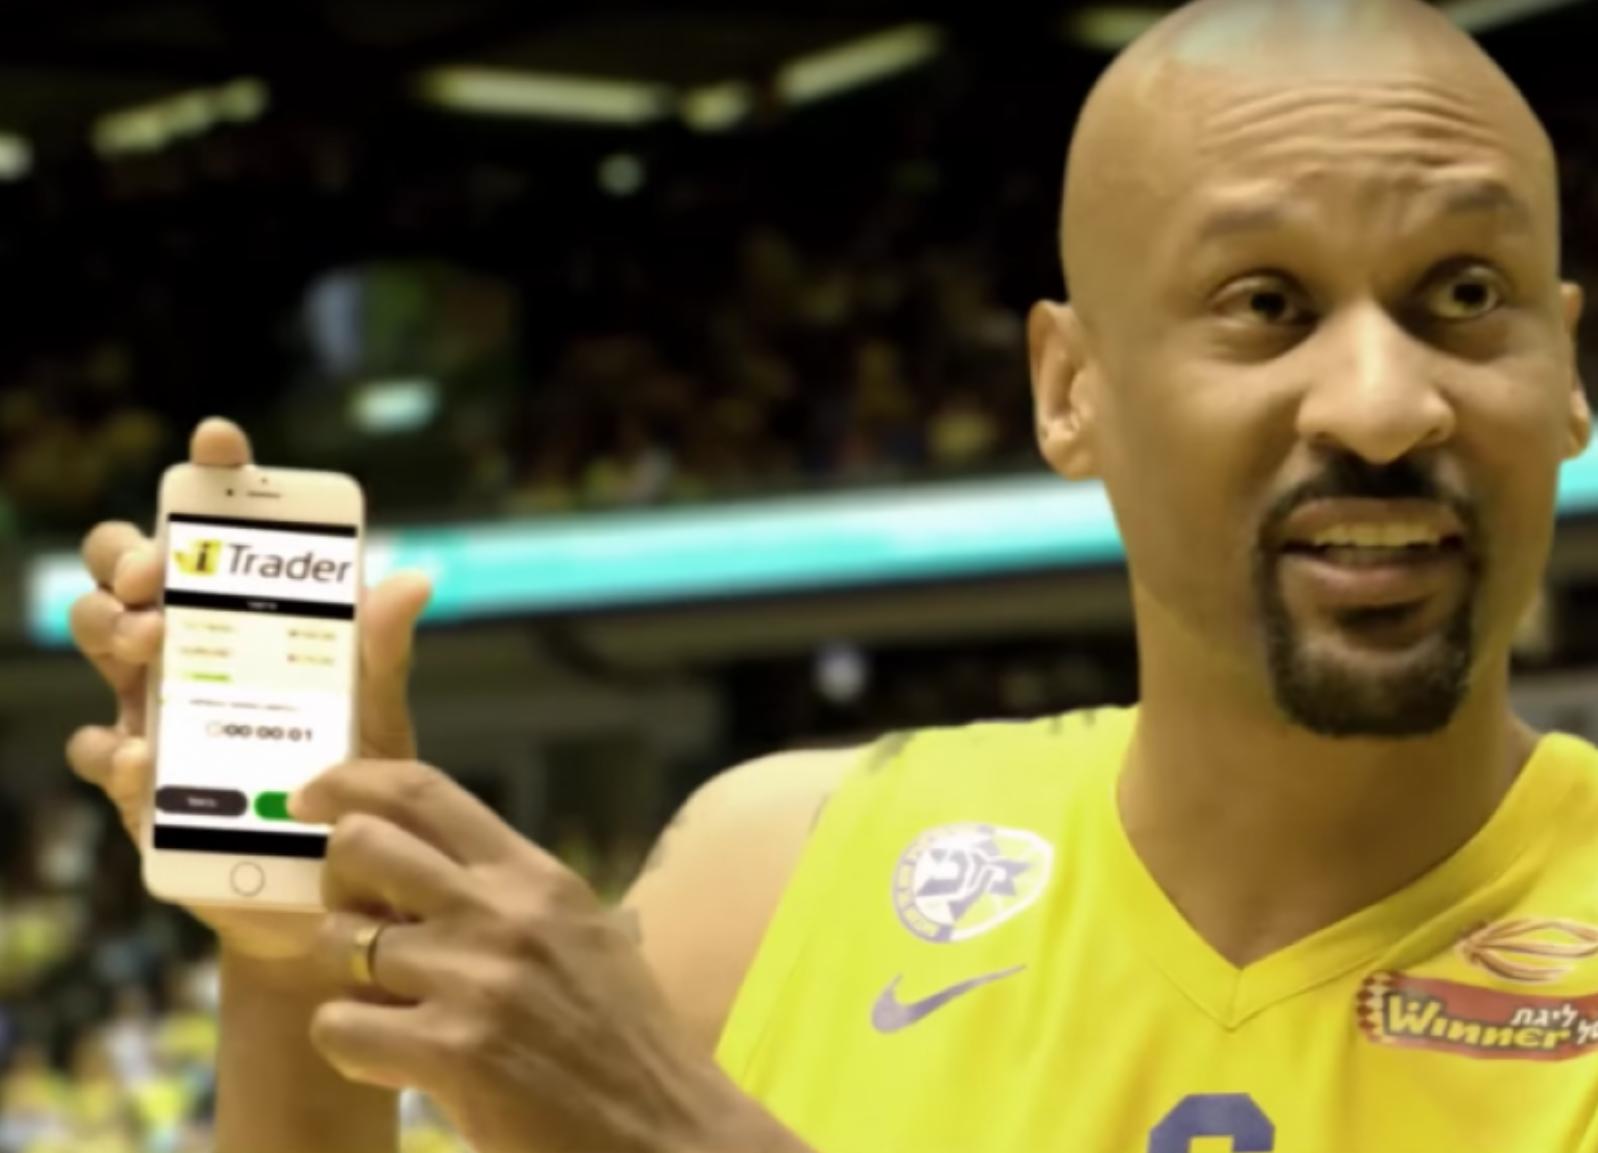 Maccabi Tel Aviv basketball players promoting iTrader